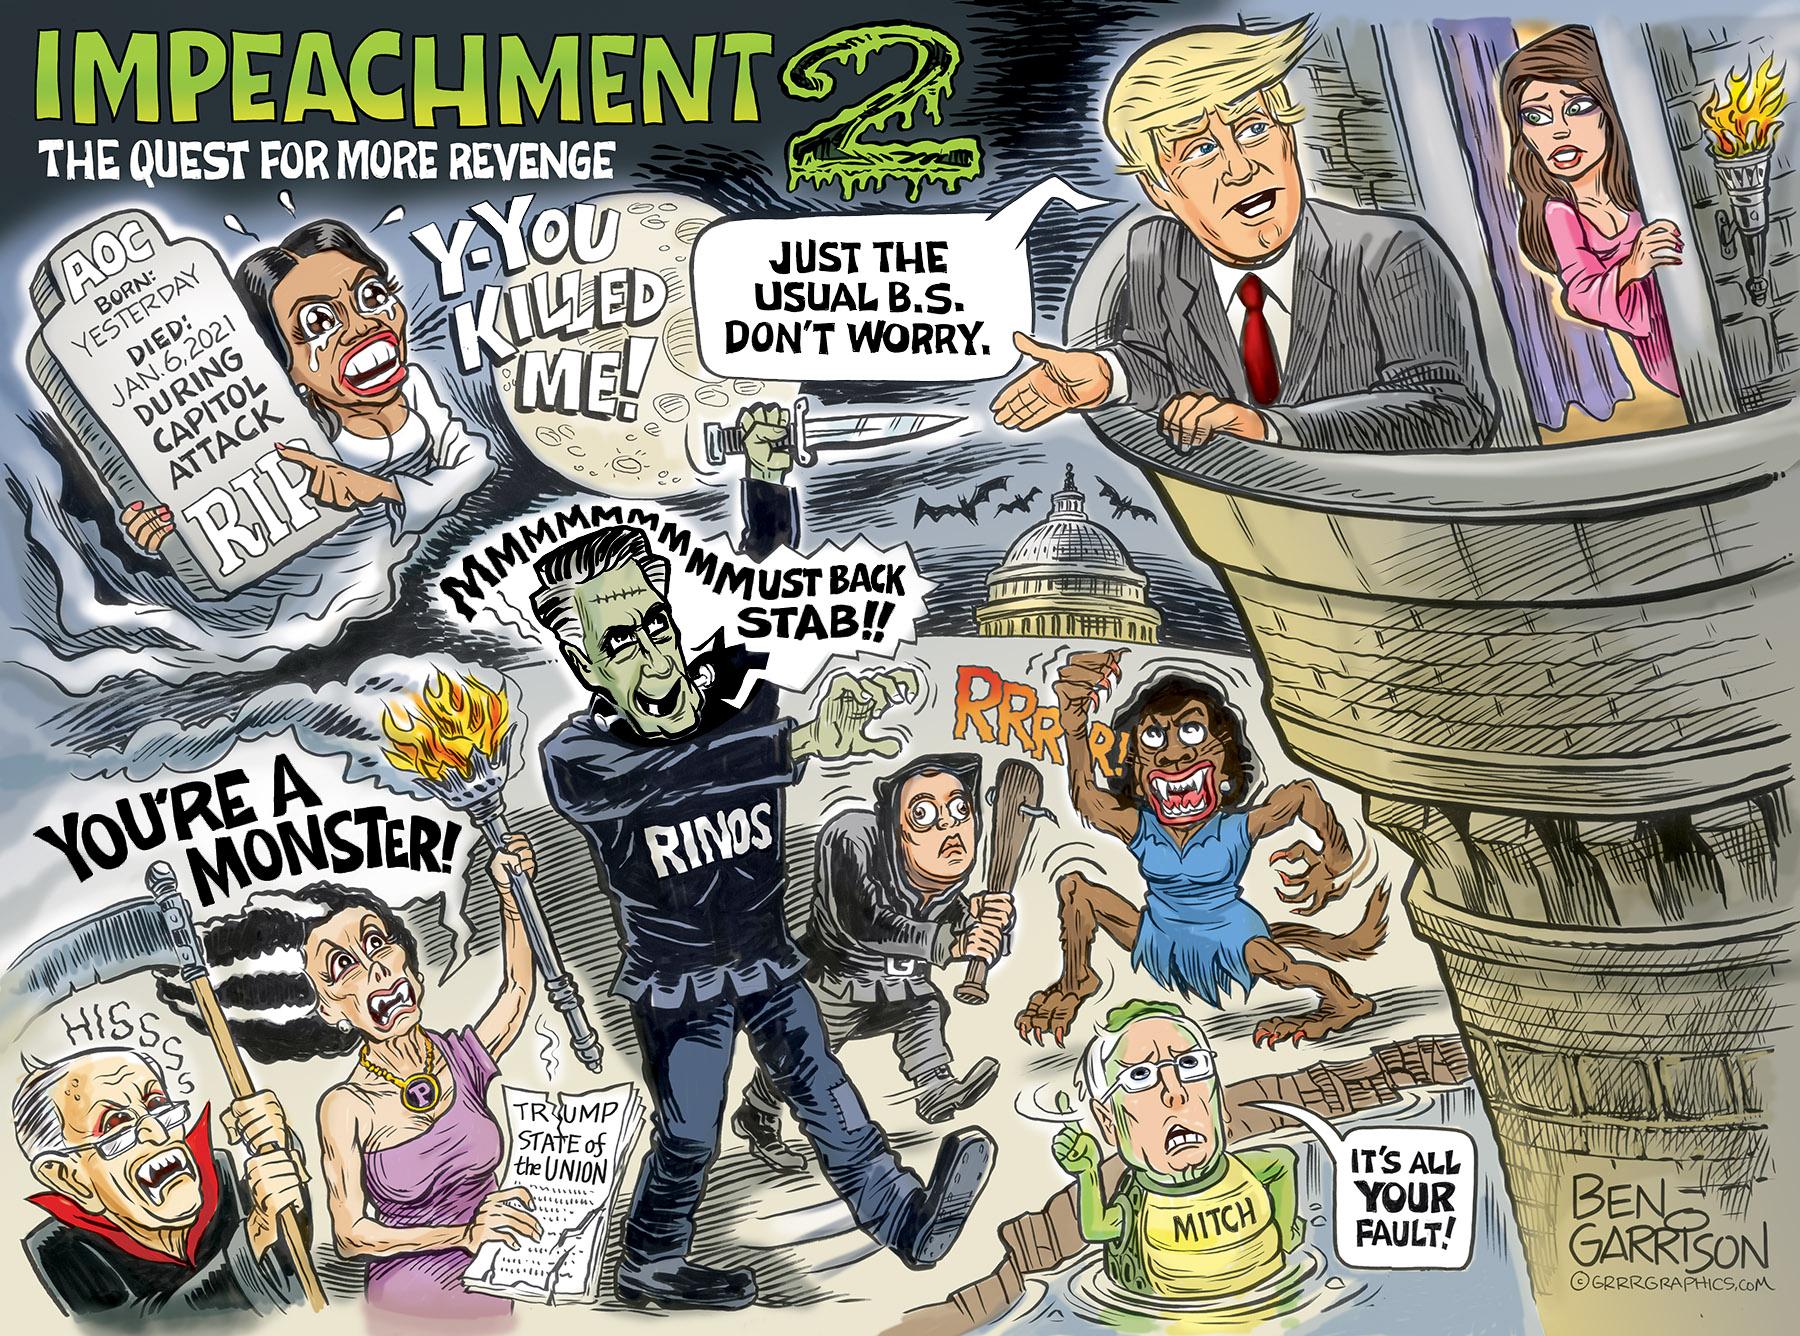 https://grrrgraphics.com/wp-content/uploads/2021/02/trump_impeachment_two.jpg